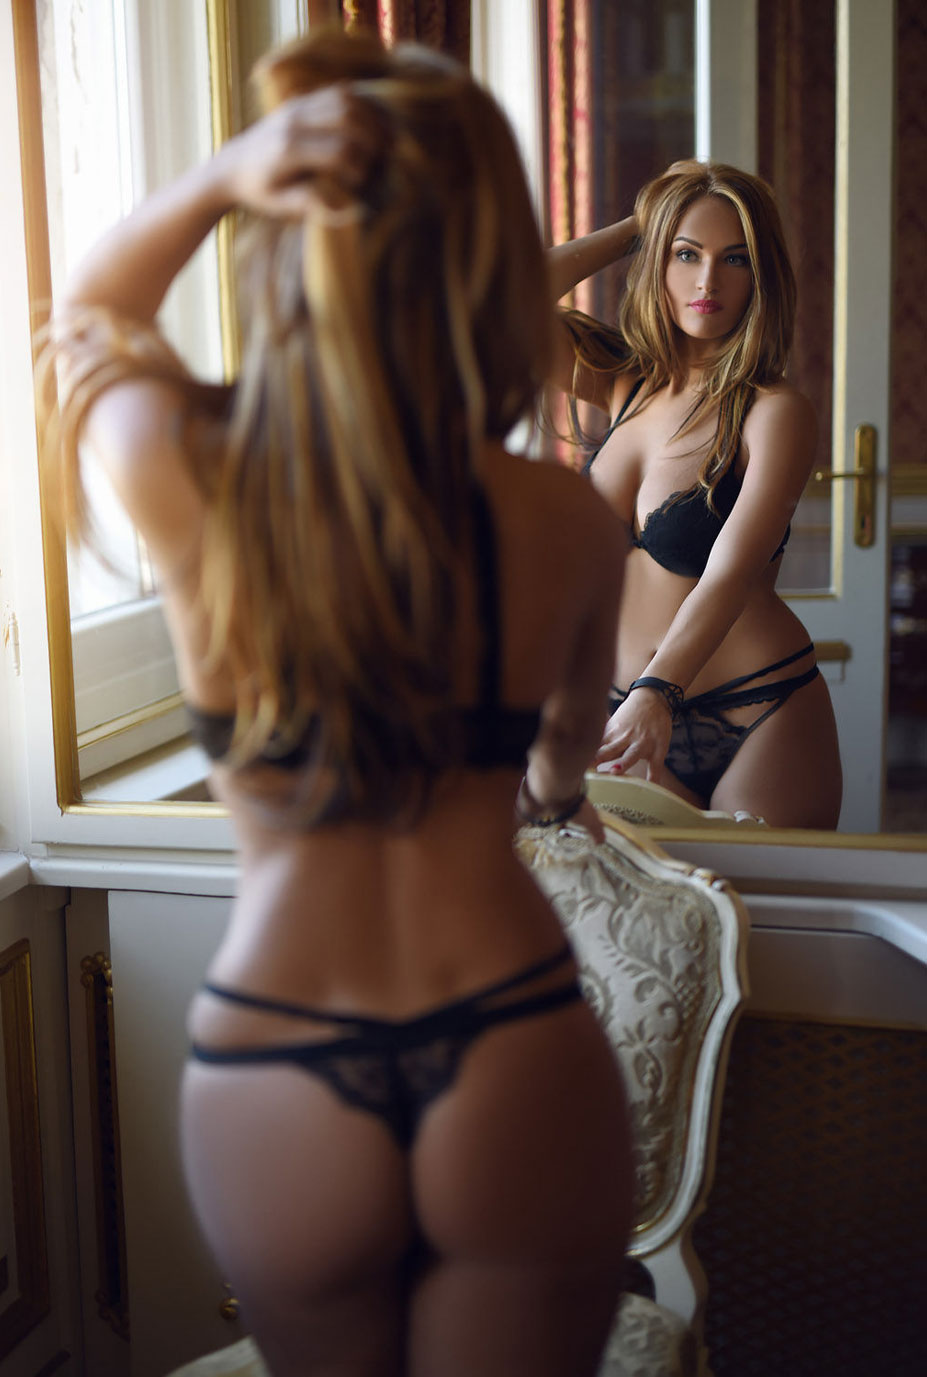 фотограф Питер Мароши / Peter Marosi nude photographer